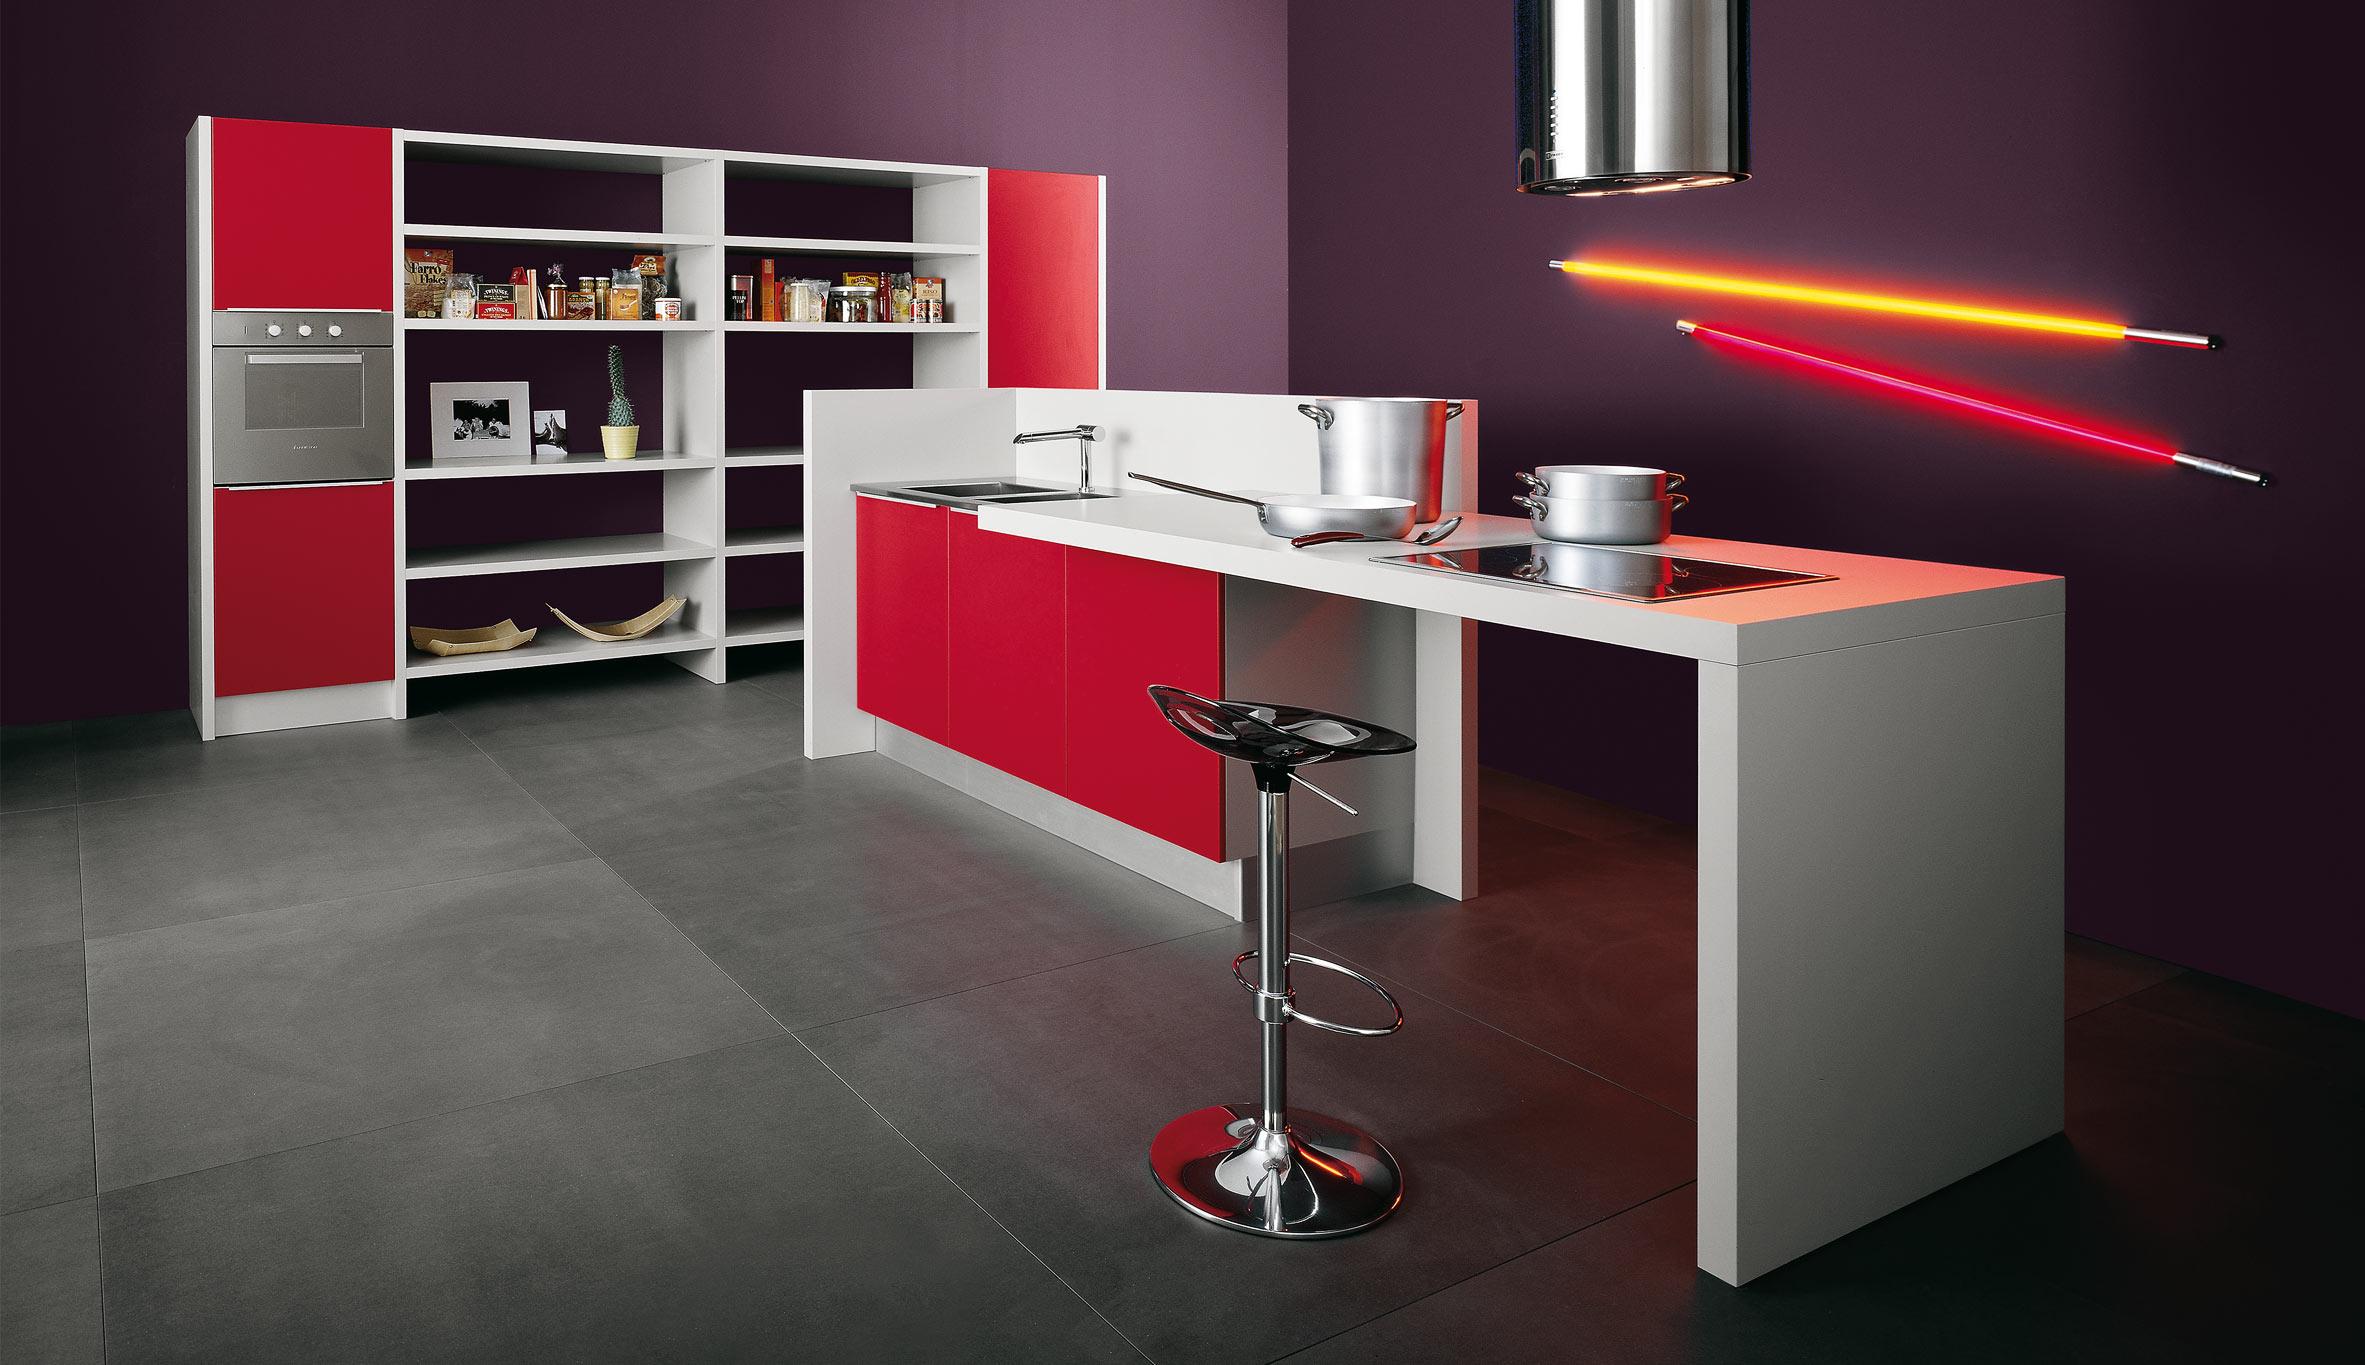 cuisine-licious-cuisine-avec-meuble-de-cuisine-rouge-design-et-idee-cuisine-rouge-blanche-idee-cuisine-photo-rouge-idee-cuisine-rouge